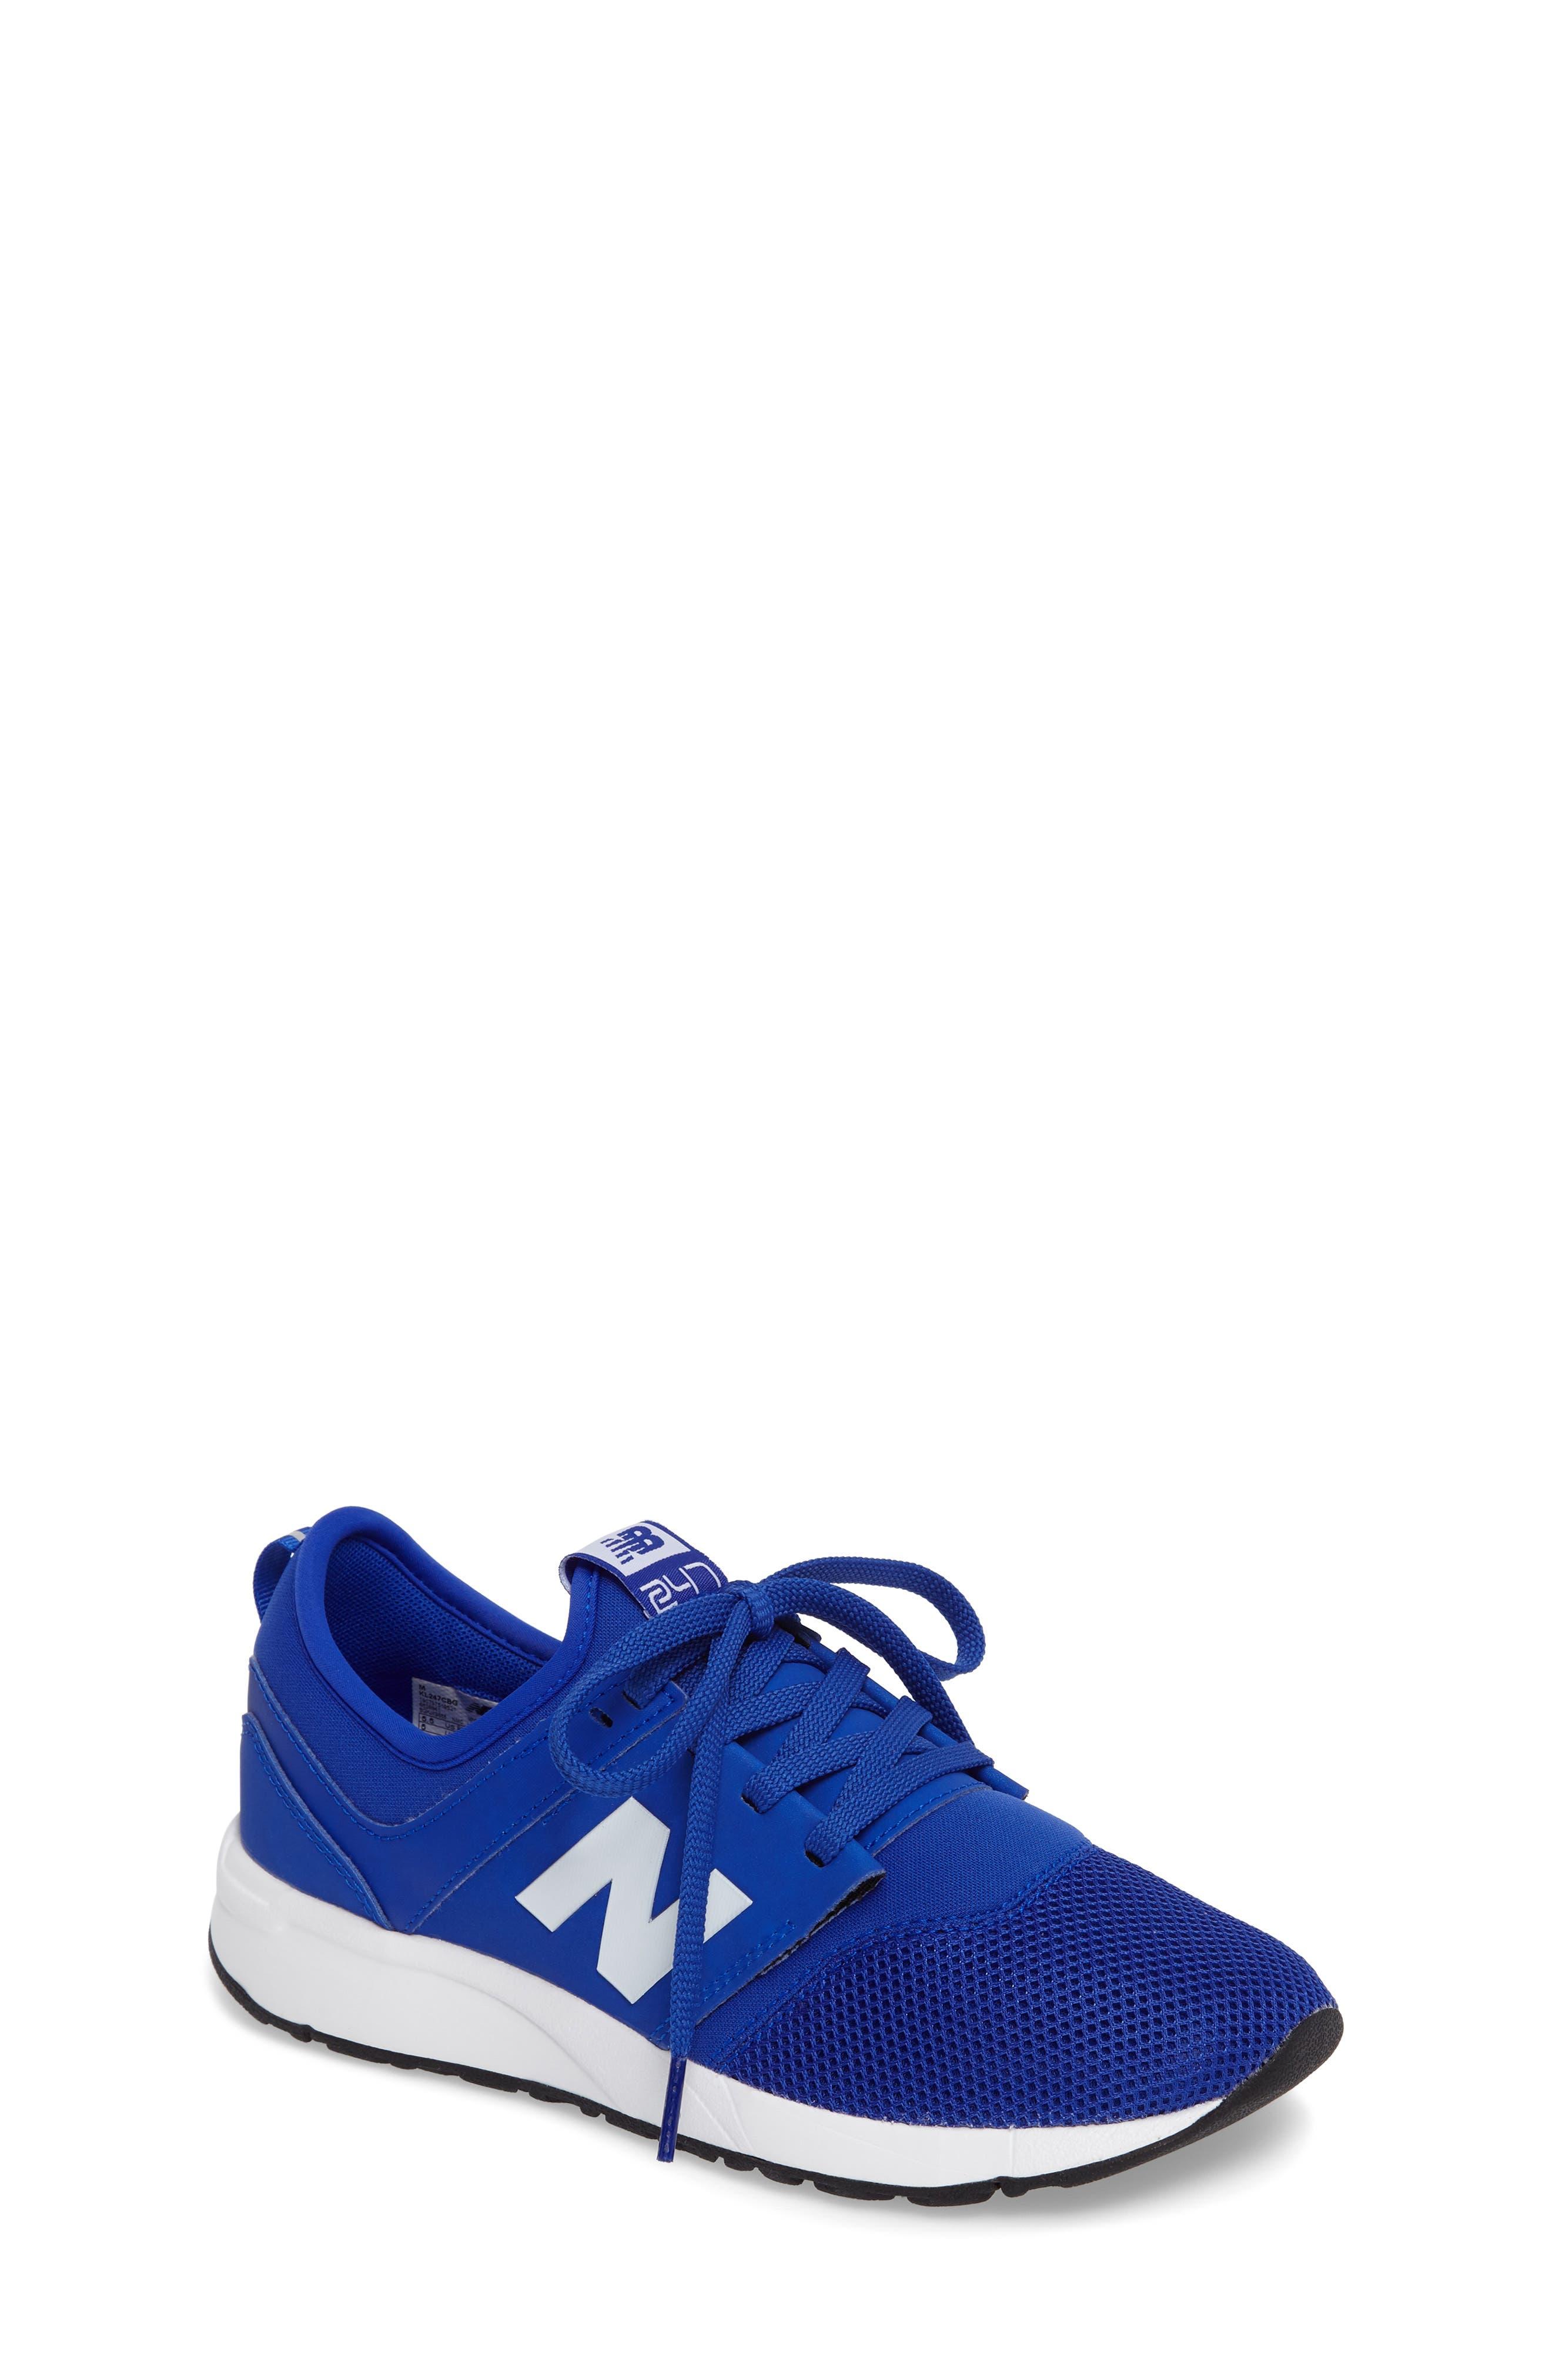 Alternate Image 1 Selected - New Balance 247 Core Sneaker (Big Kid)